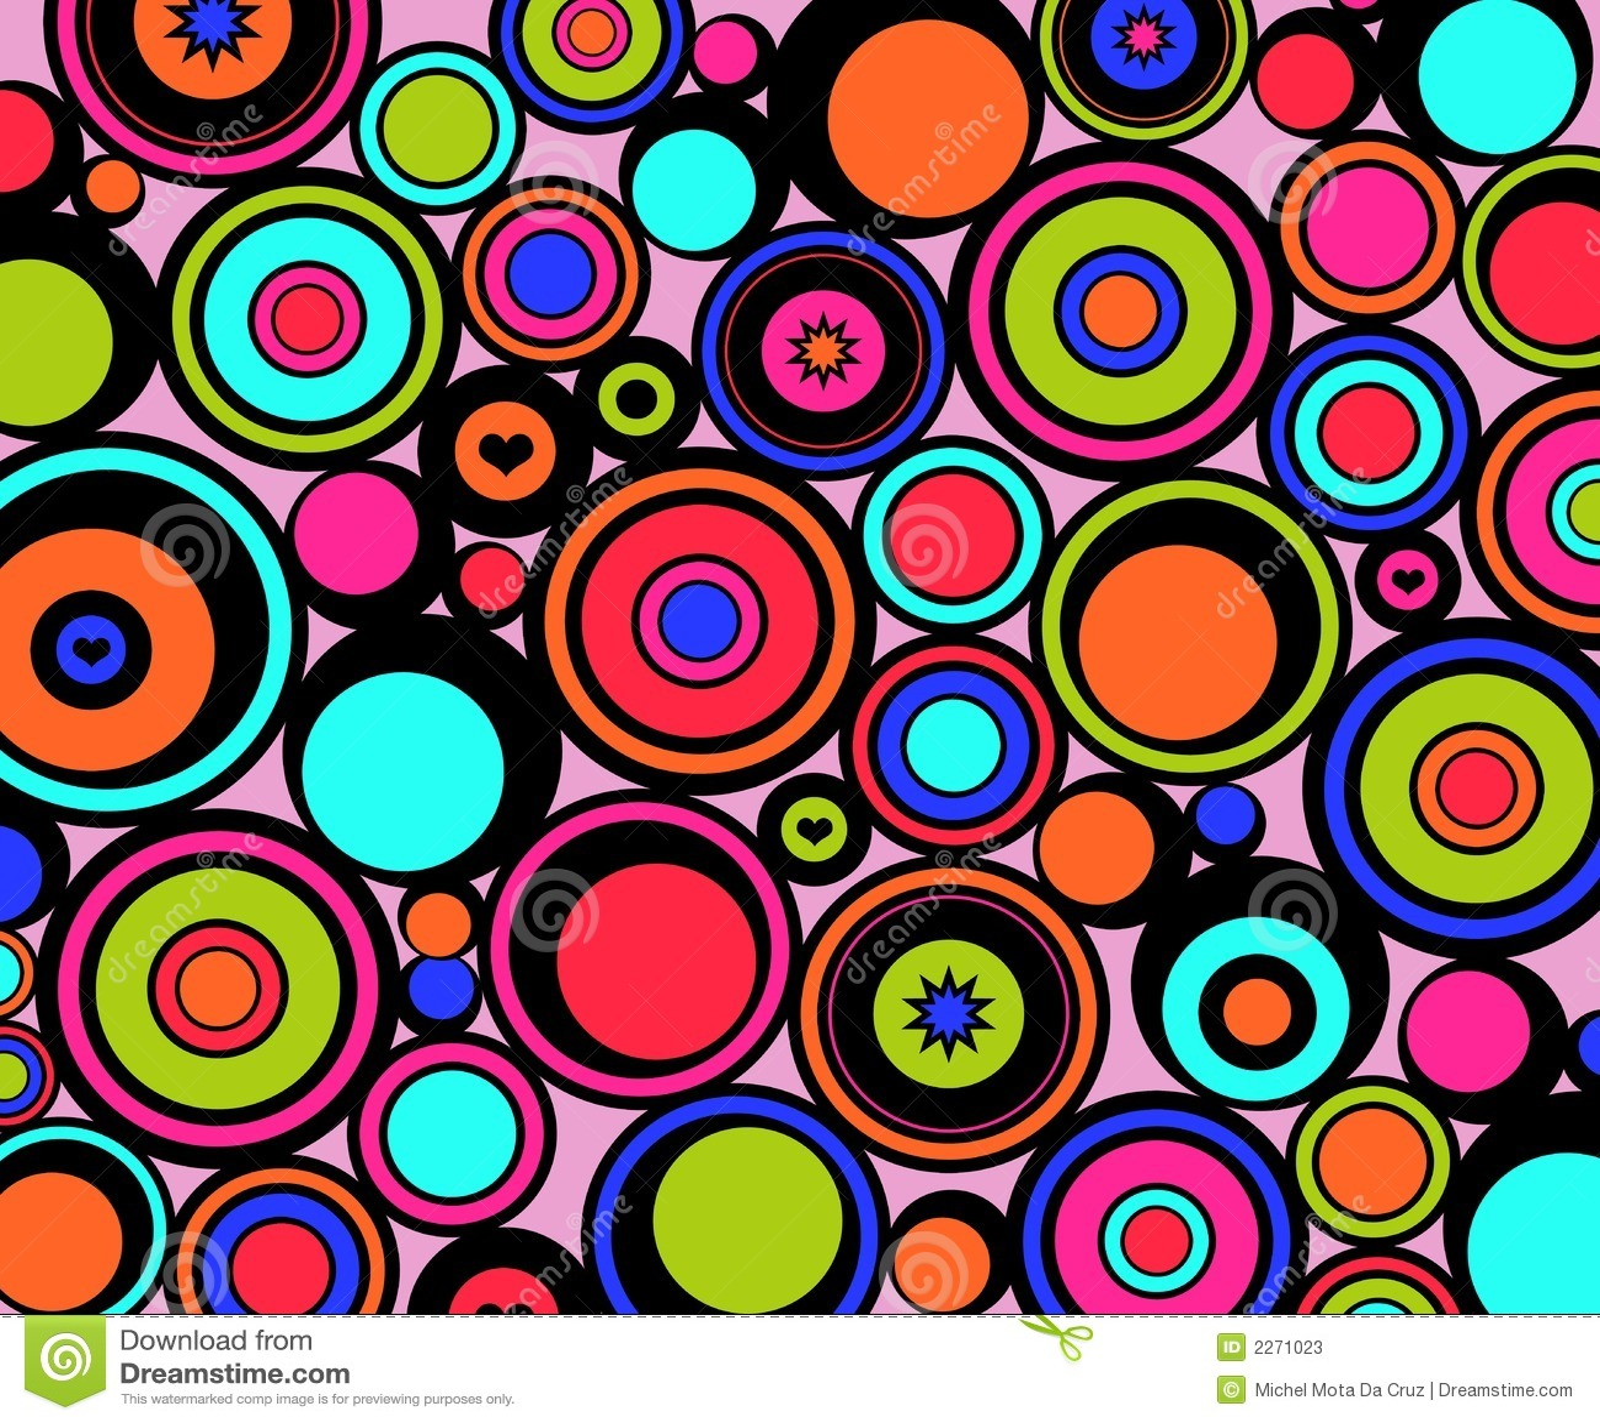 Abstract Circles Retro Stock Illustration. Illustration Of